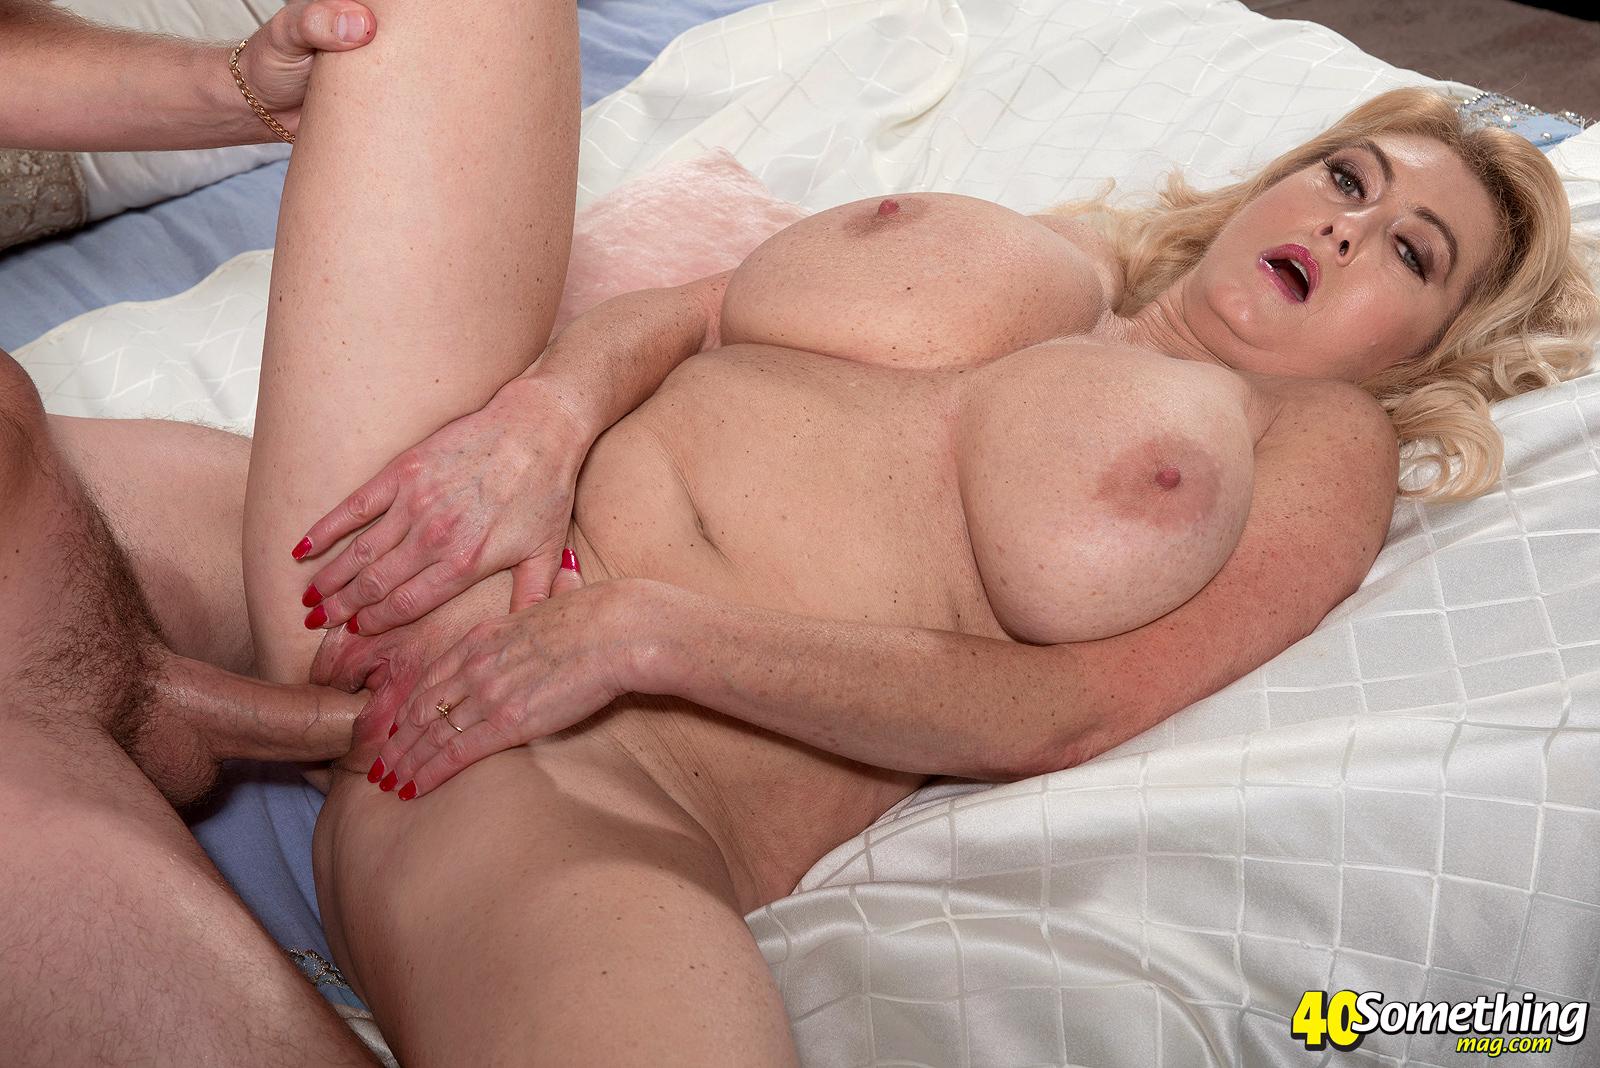 Truly nice tits 2 with krystal de boor - 5 5